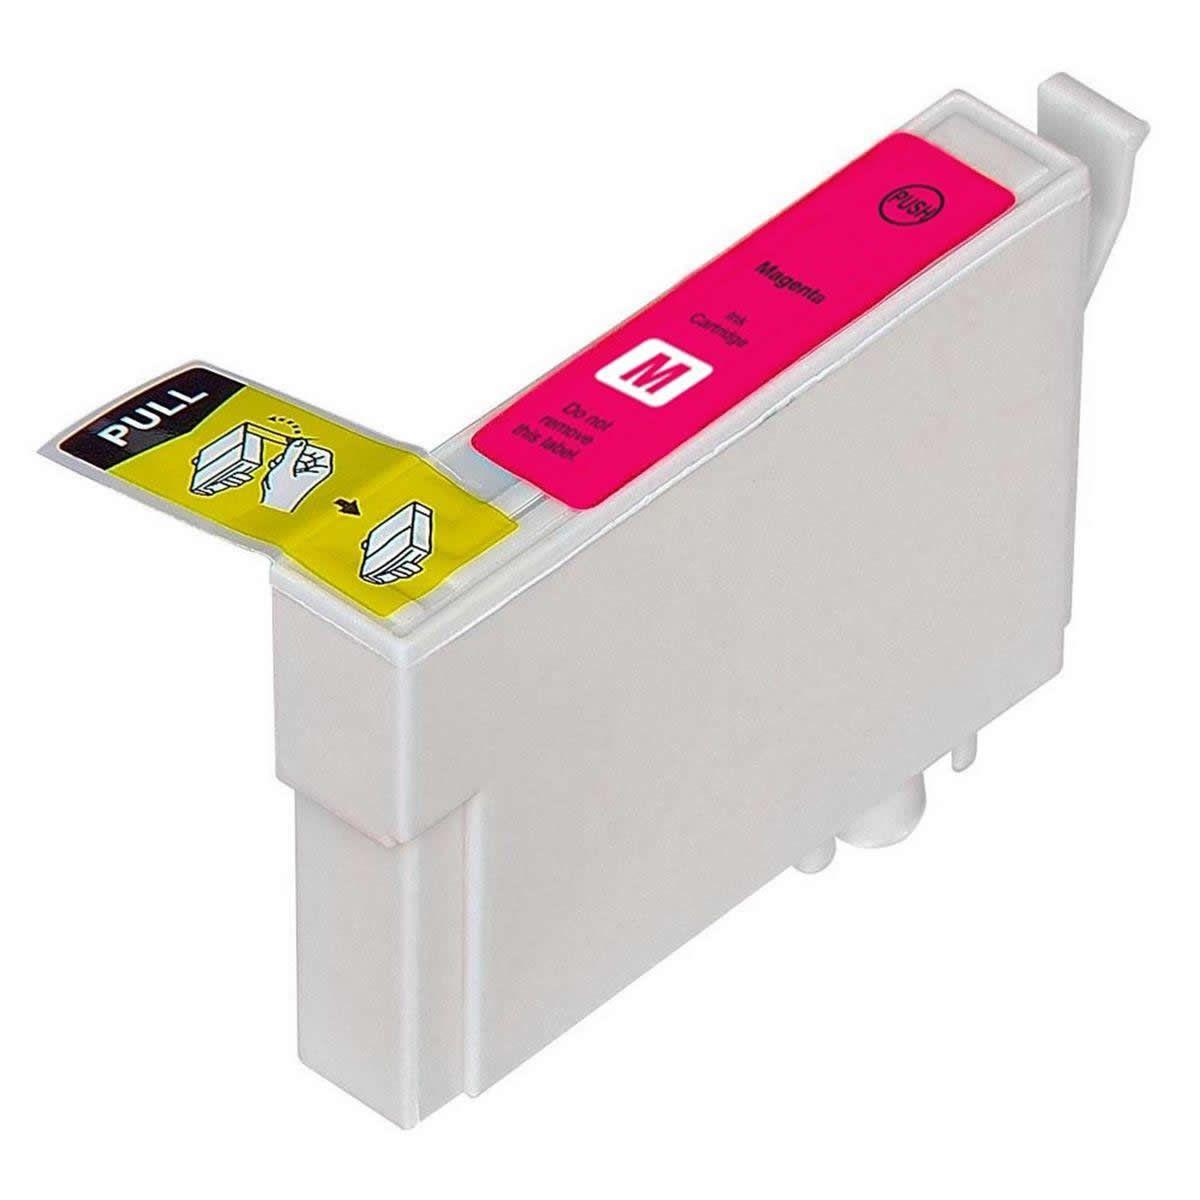 Cartucho TO733N TO73320 733 magenta compatível Epson para C79 CX3900 CX4900 CX5900 TX115